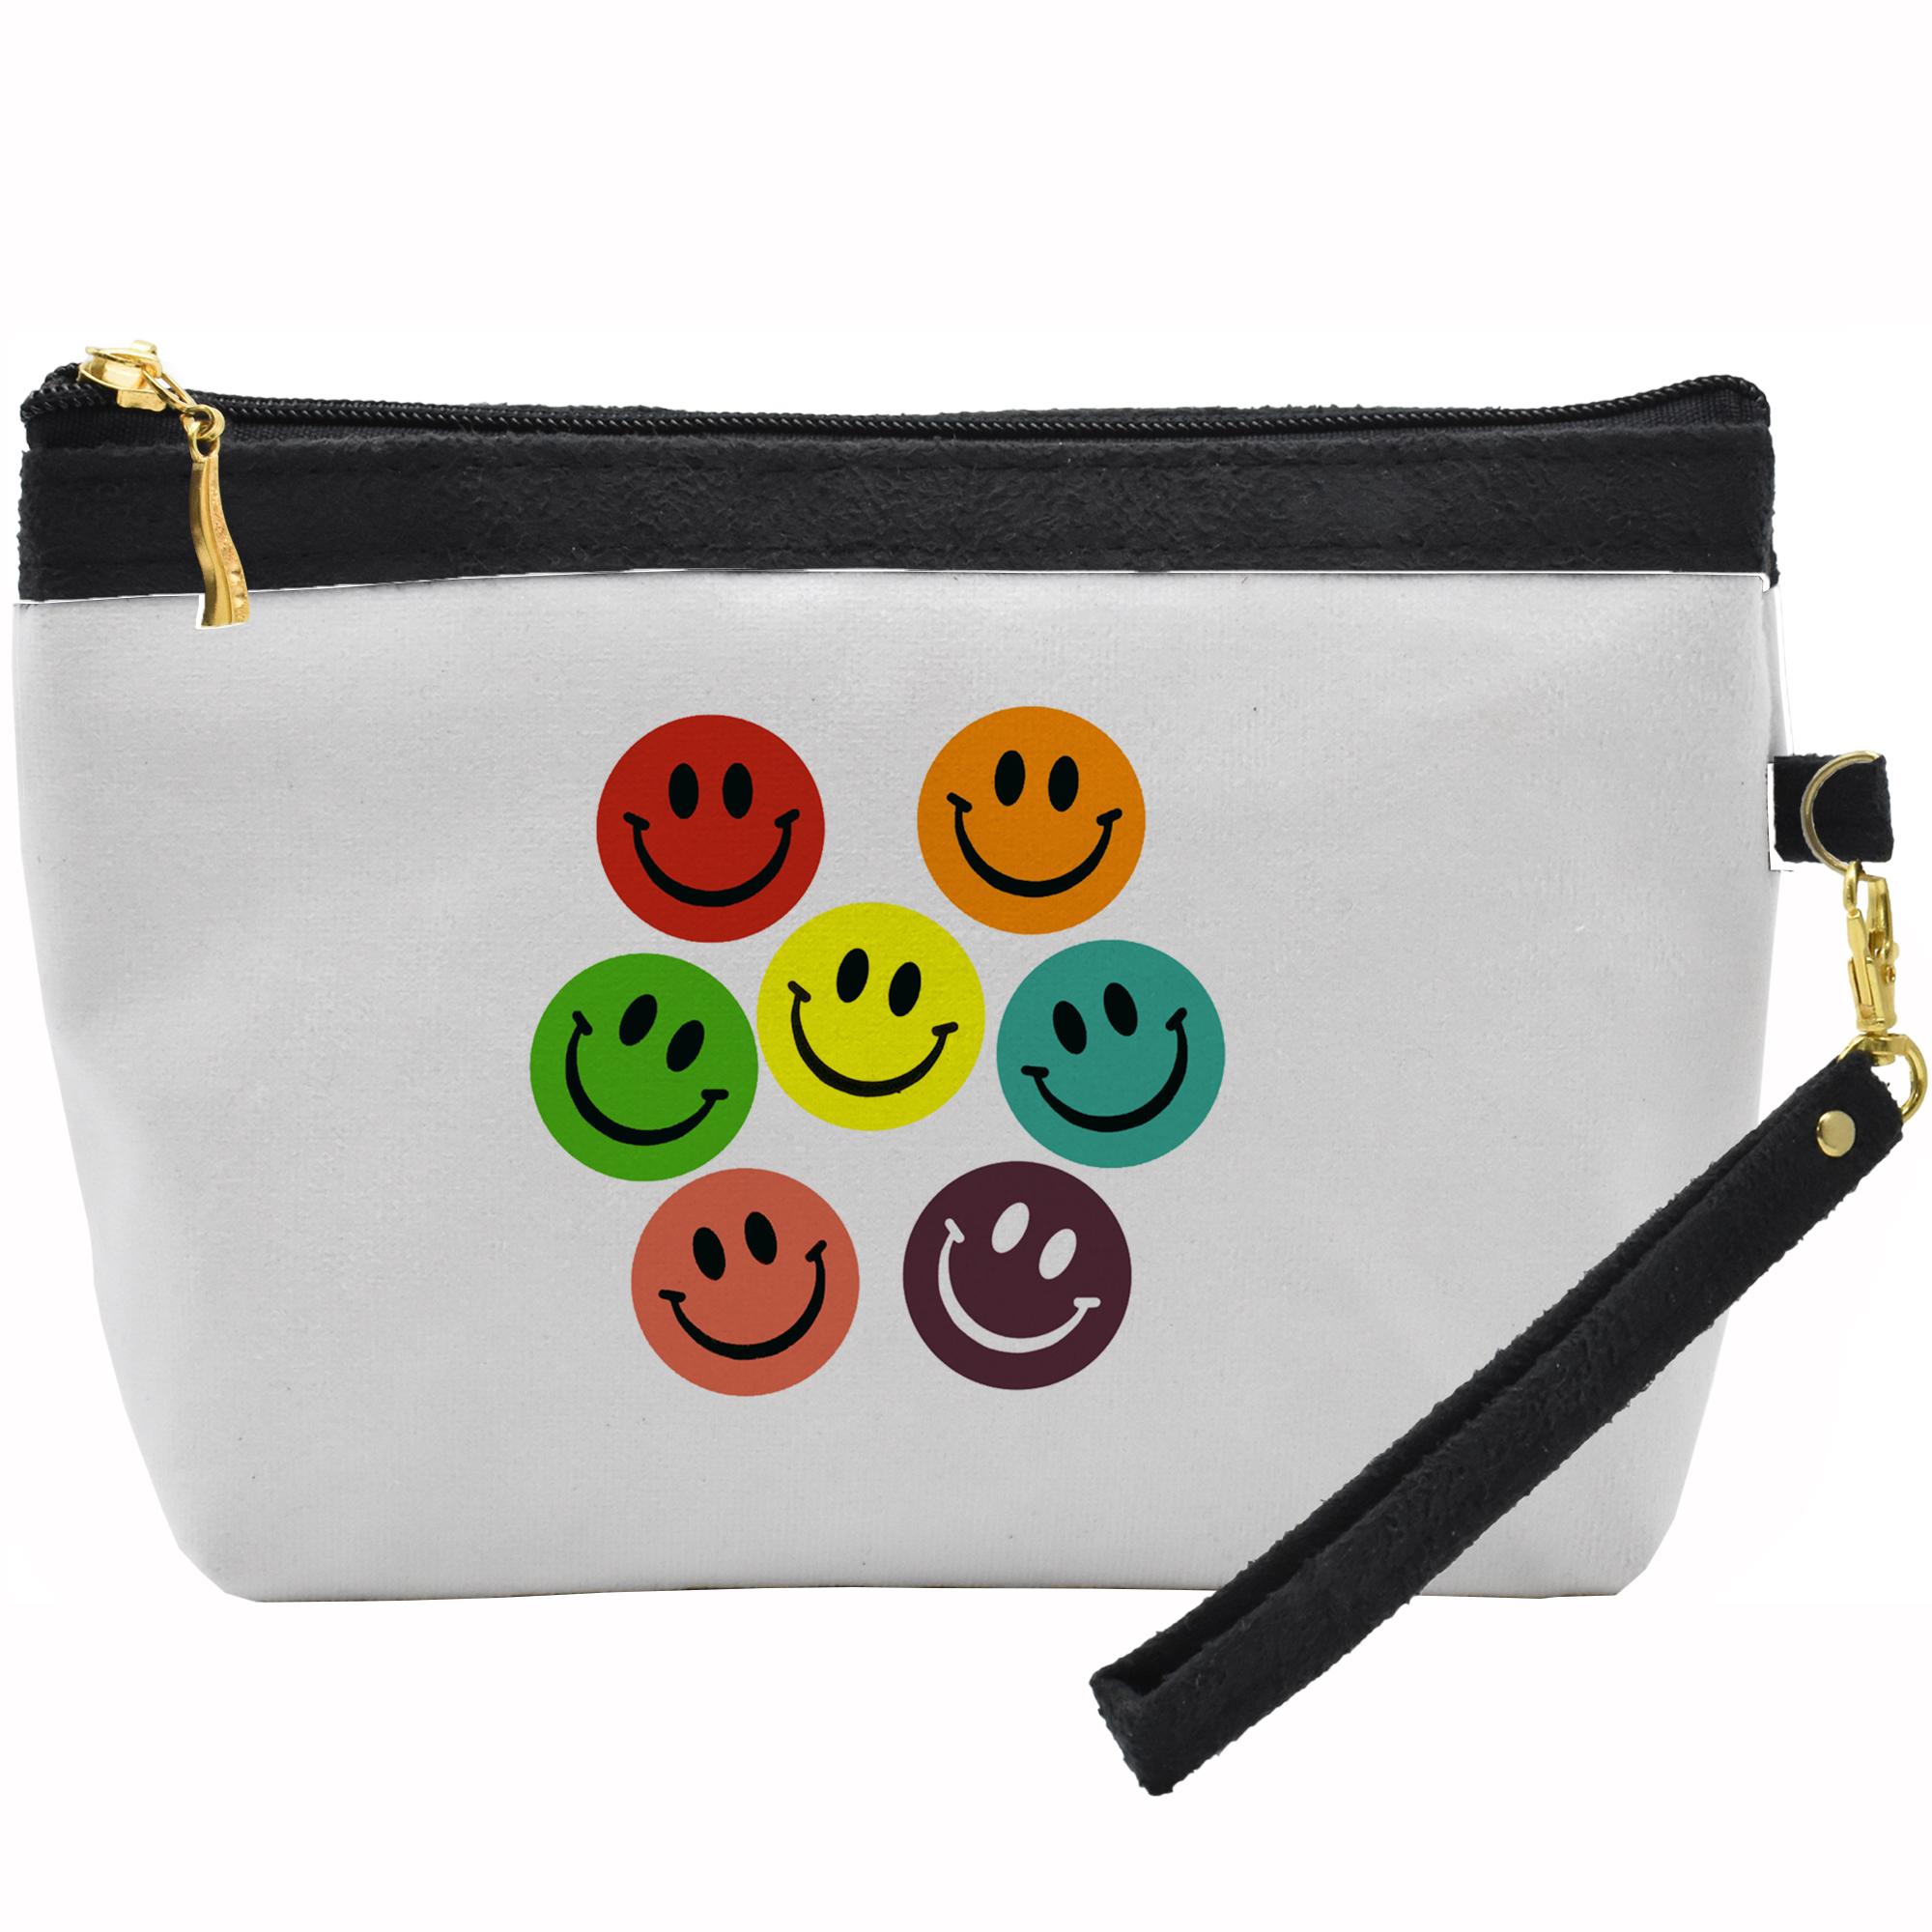 کیف لوازم آرایشی طرح ایموجی خنده کد C13